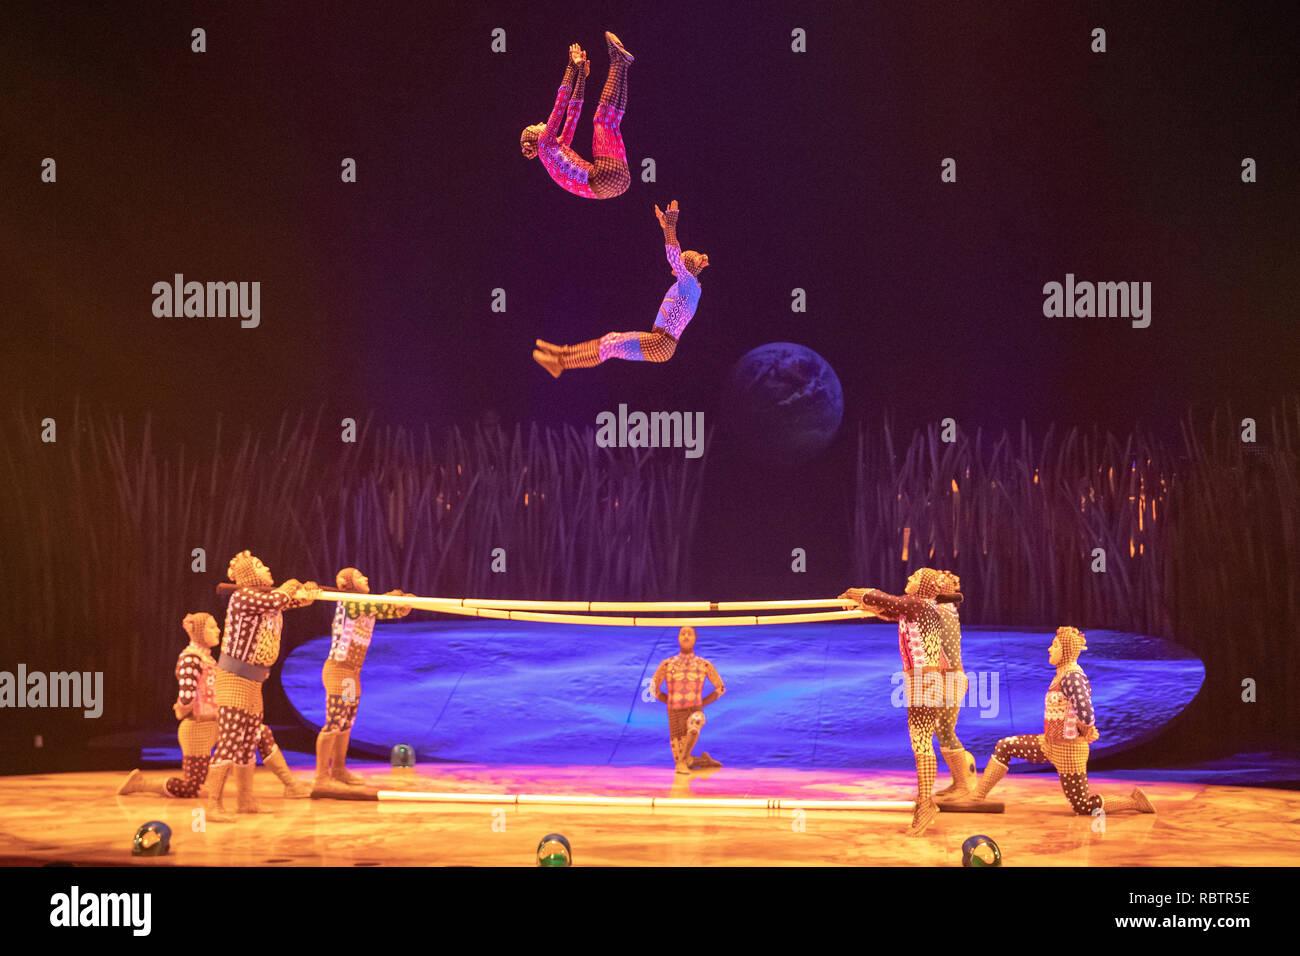 A cast member of Cirque Du Soleil performs in Cirque Du